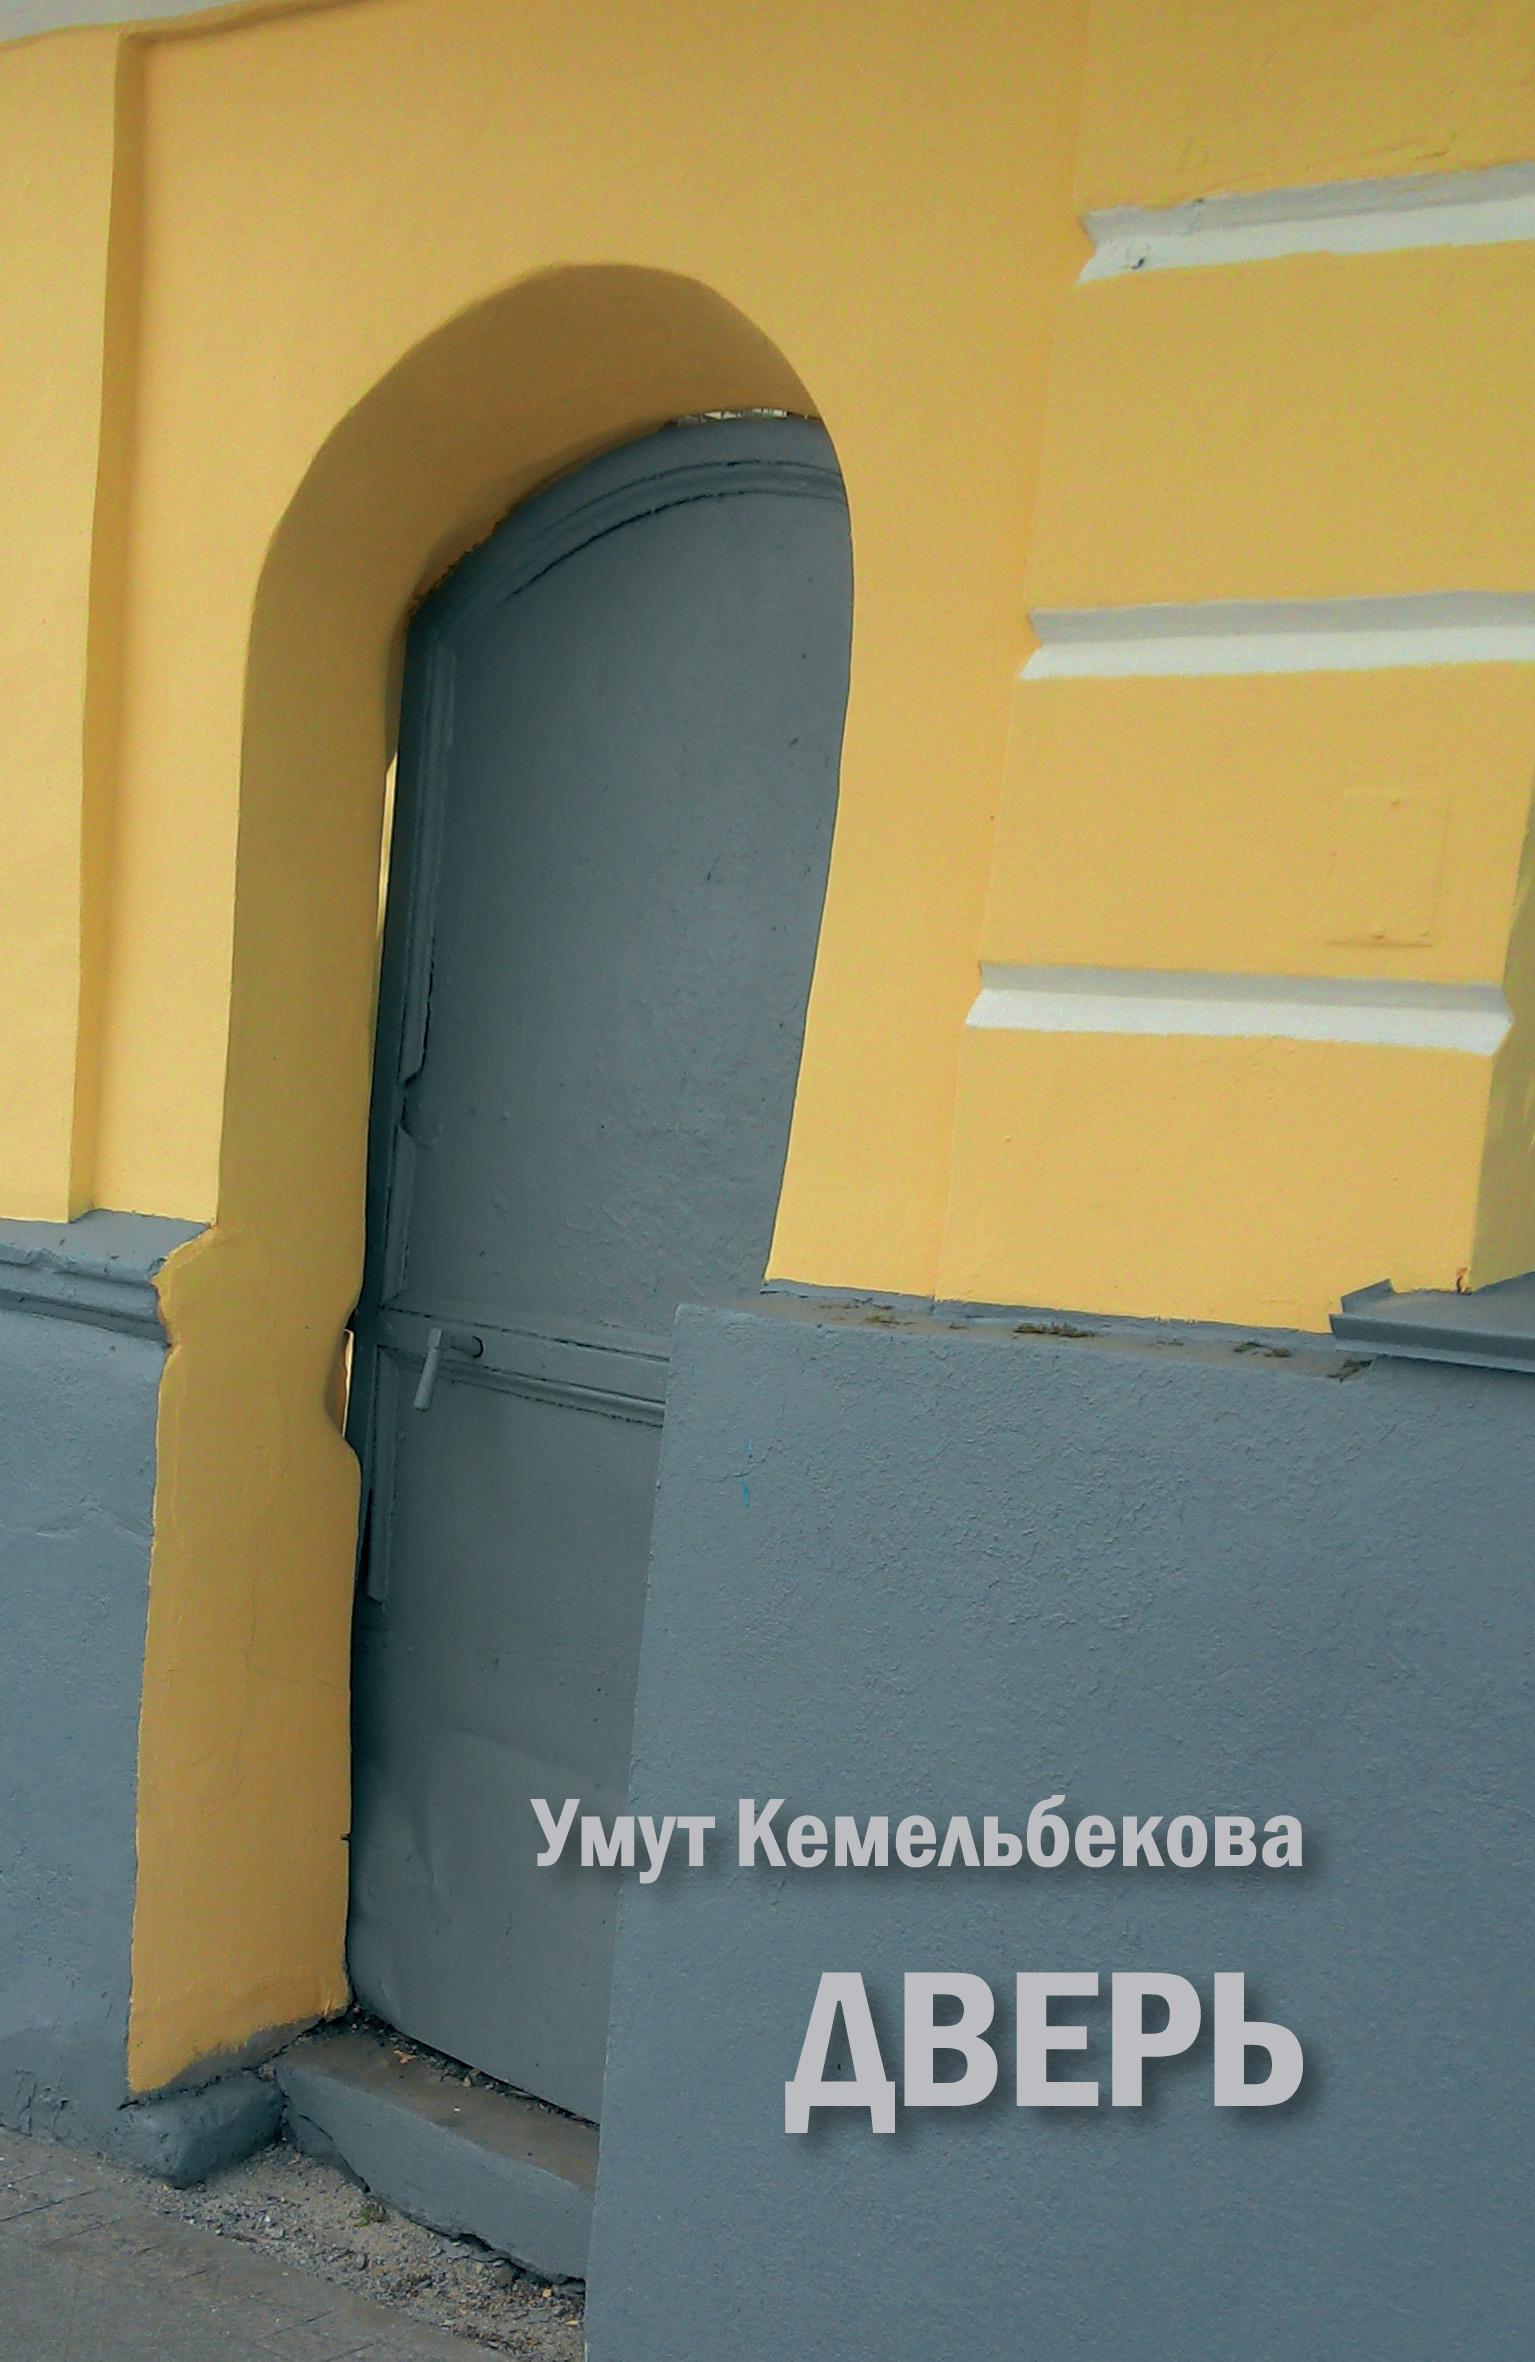 Умут Кемельбекова Дверь (сборник) умут кемельбекова переход